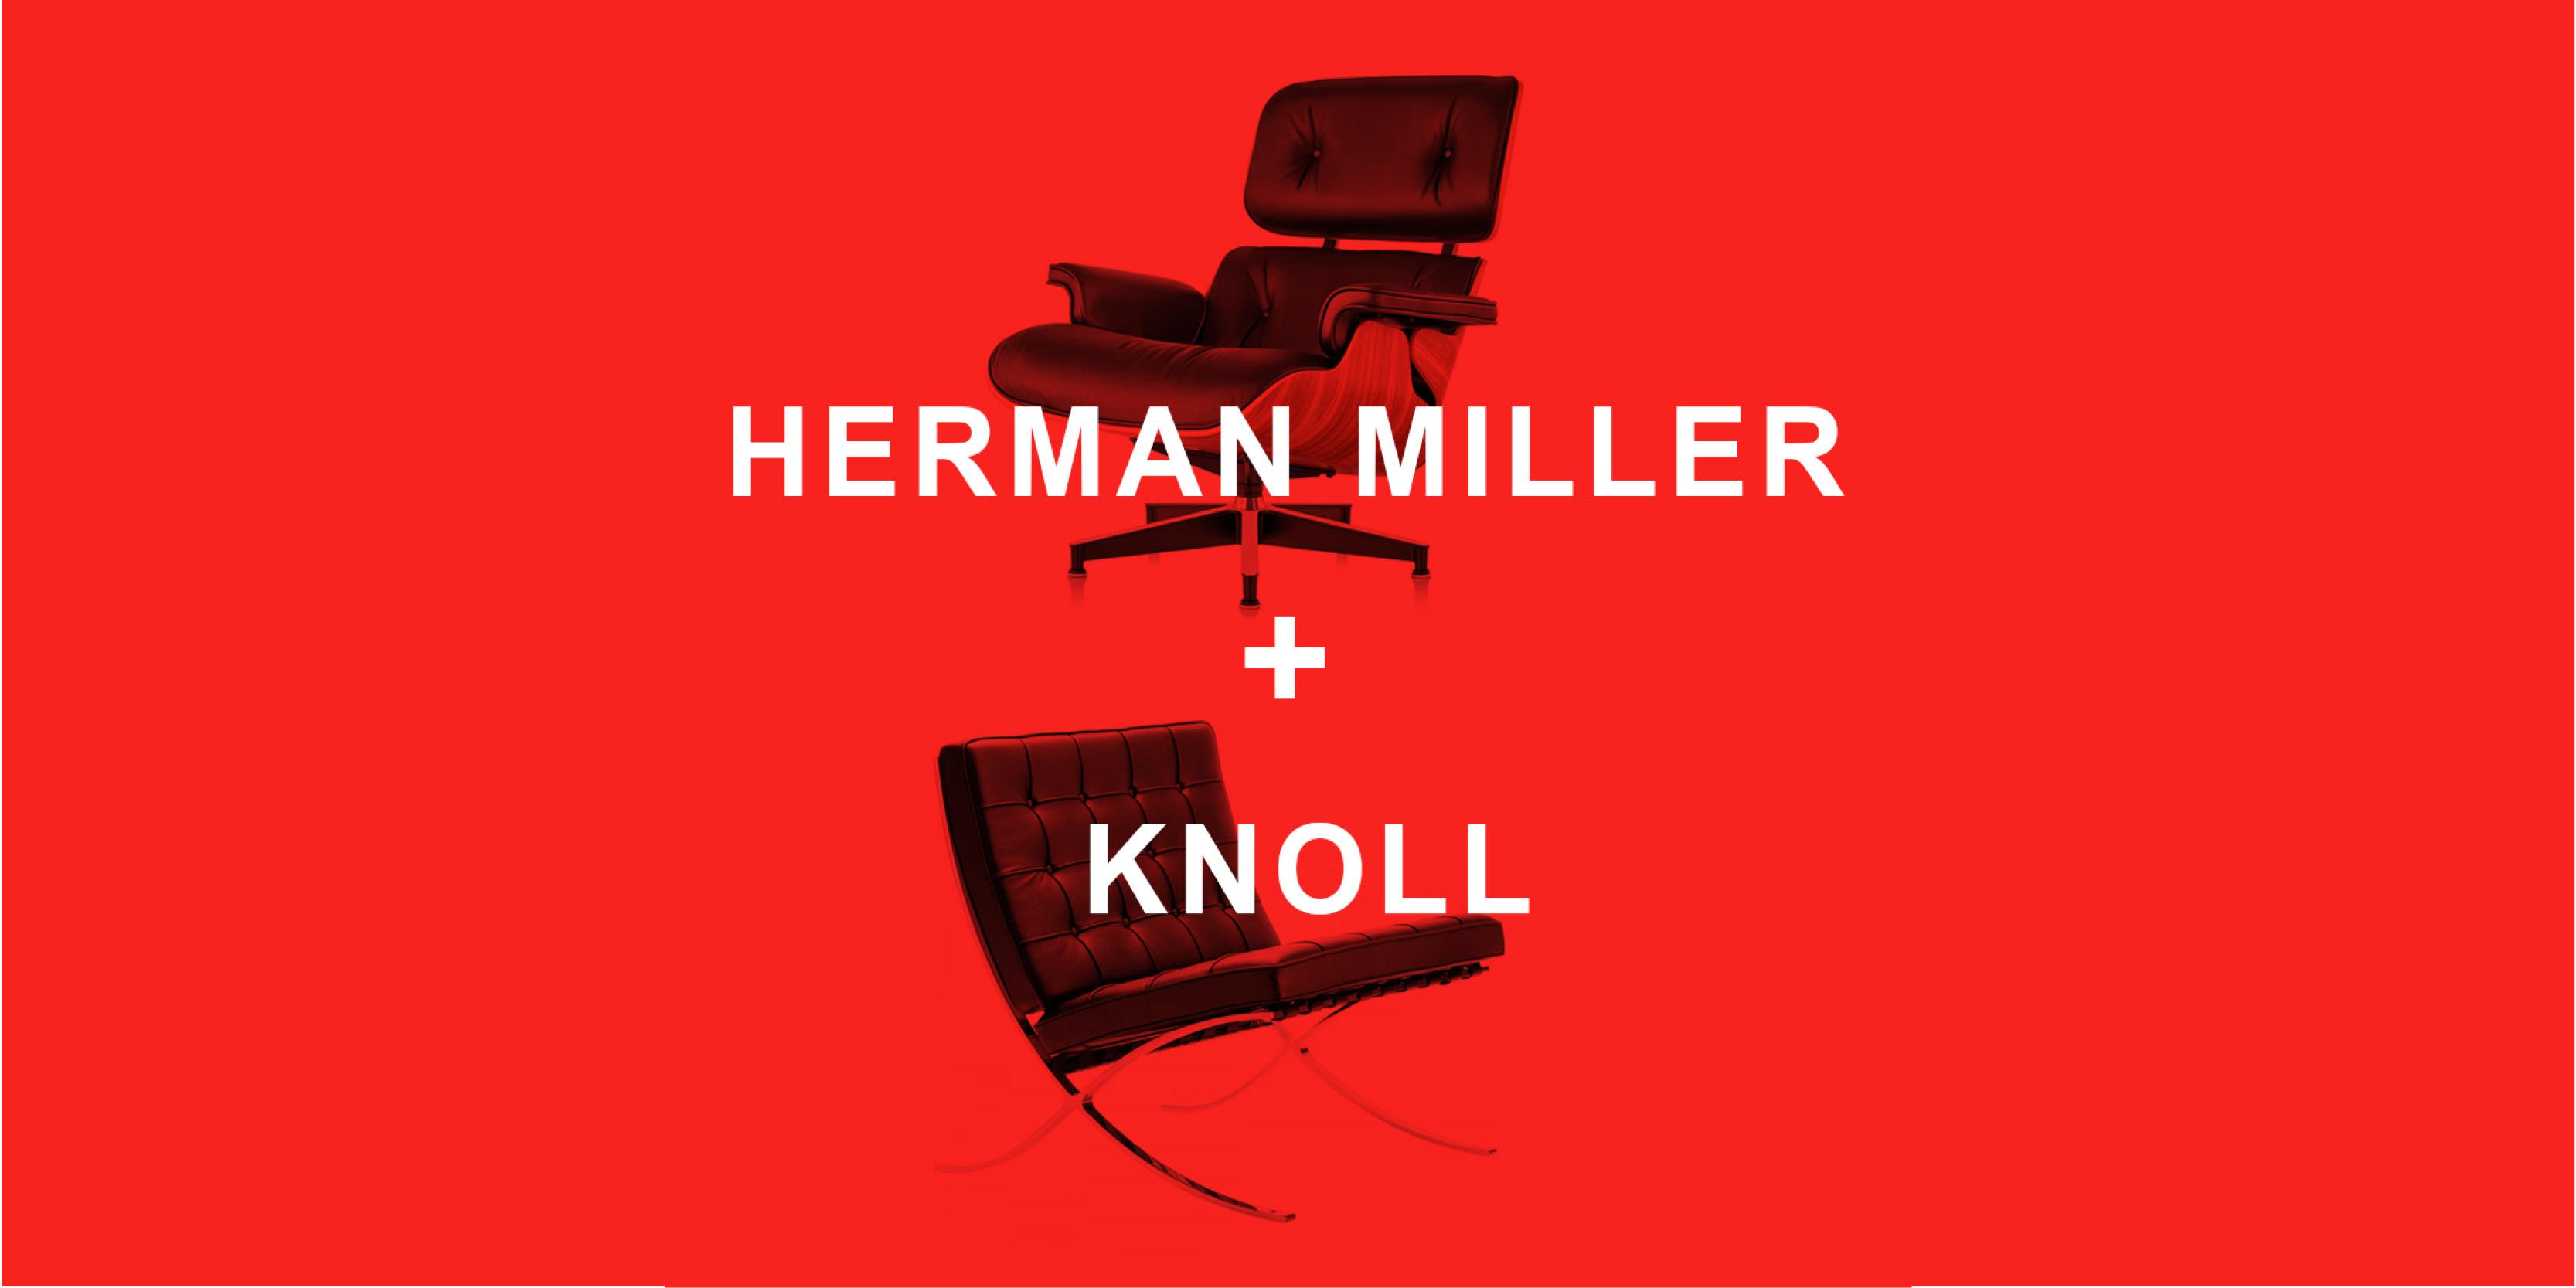 Herman Miller + Knoll